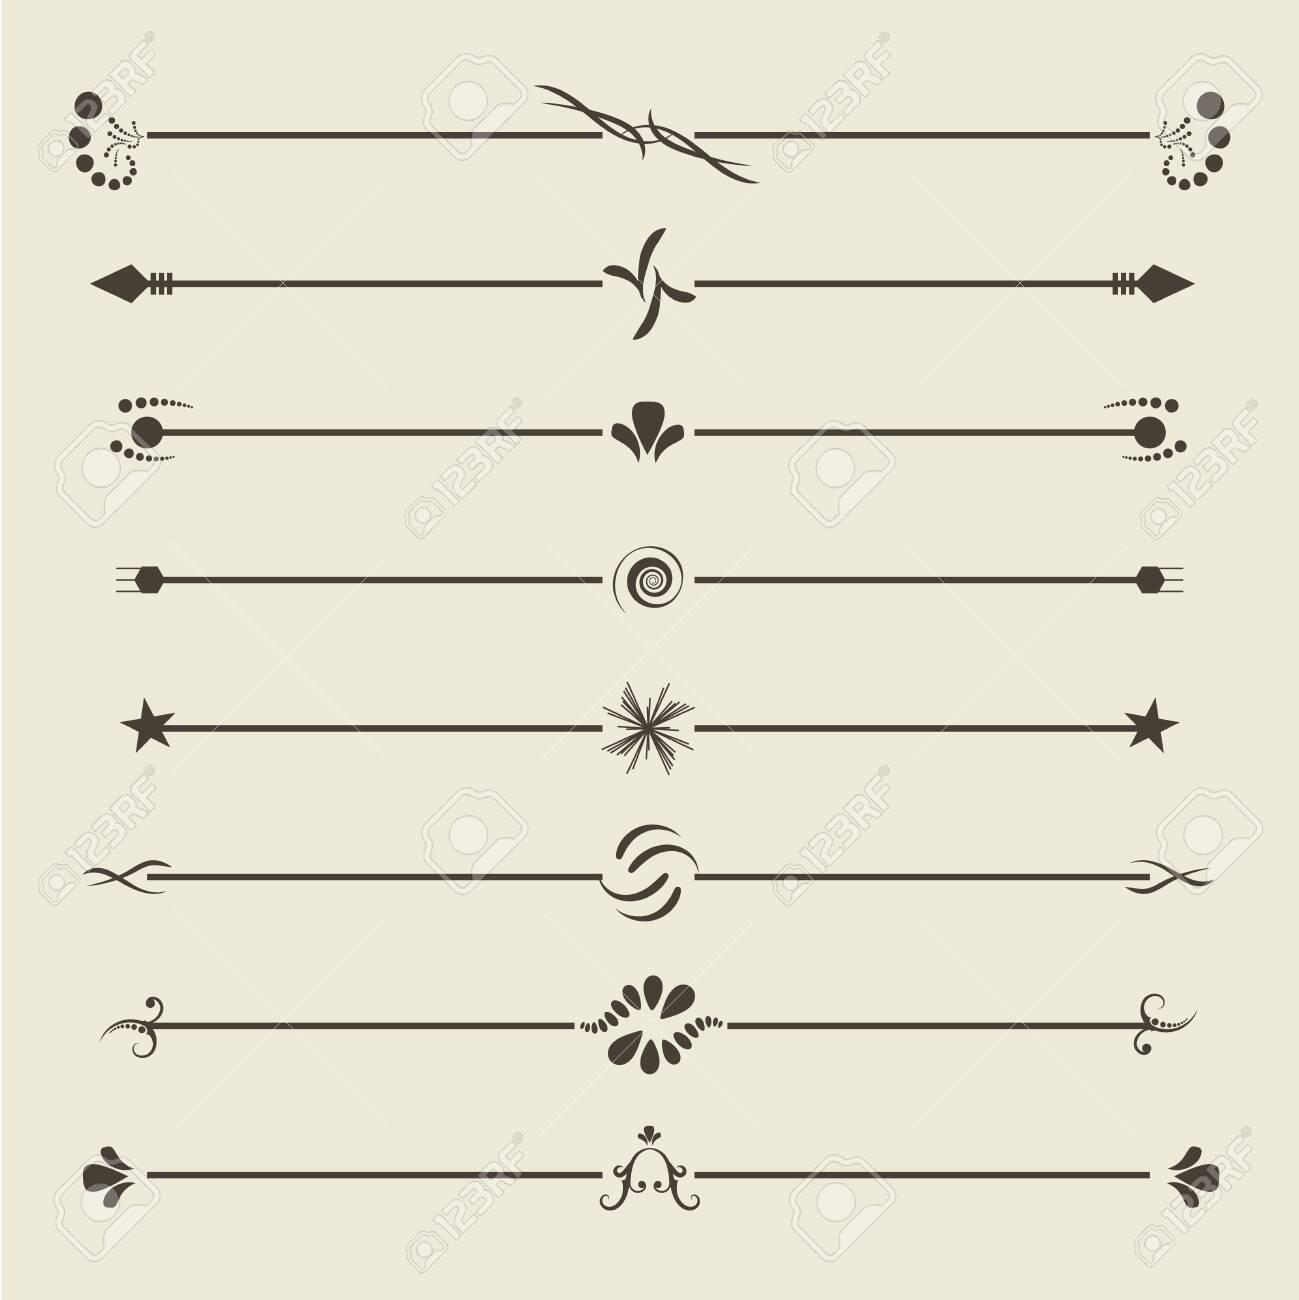 Brown calligraphic swirl dividers. Vintage Ornament Greeting Card. Ornament Retro Invitation. Certificate frame element. Jpeg illustration - 138281337